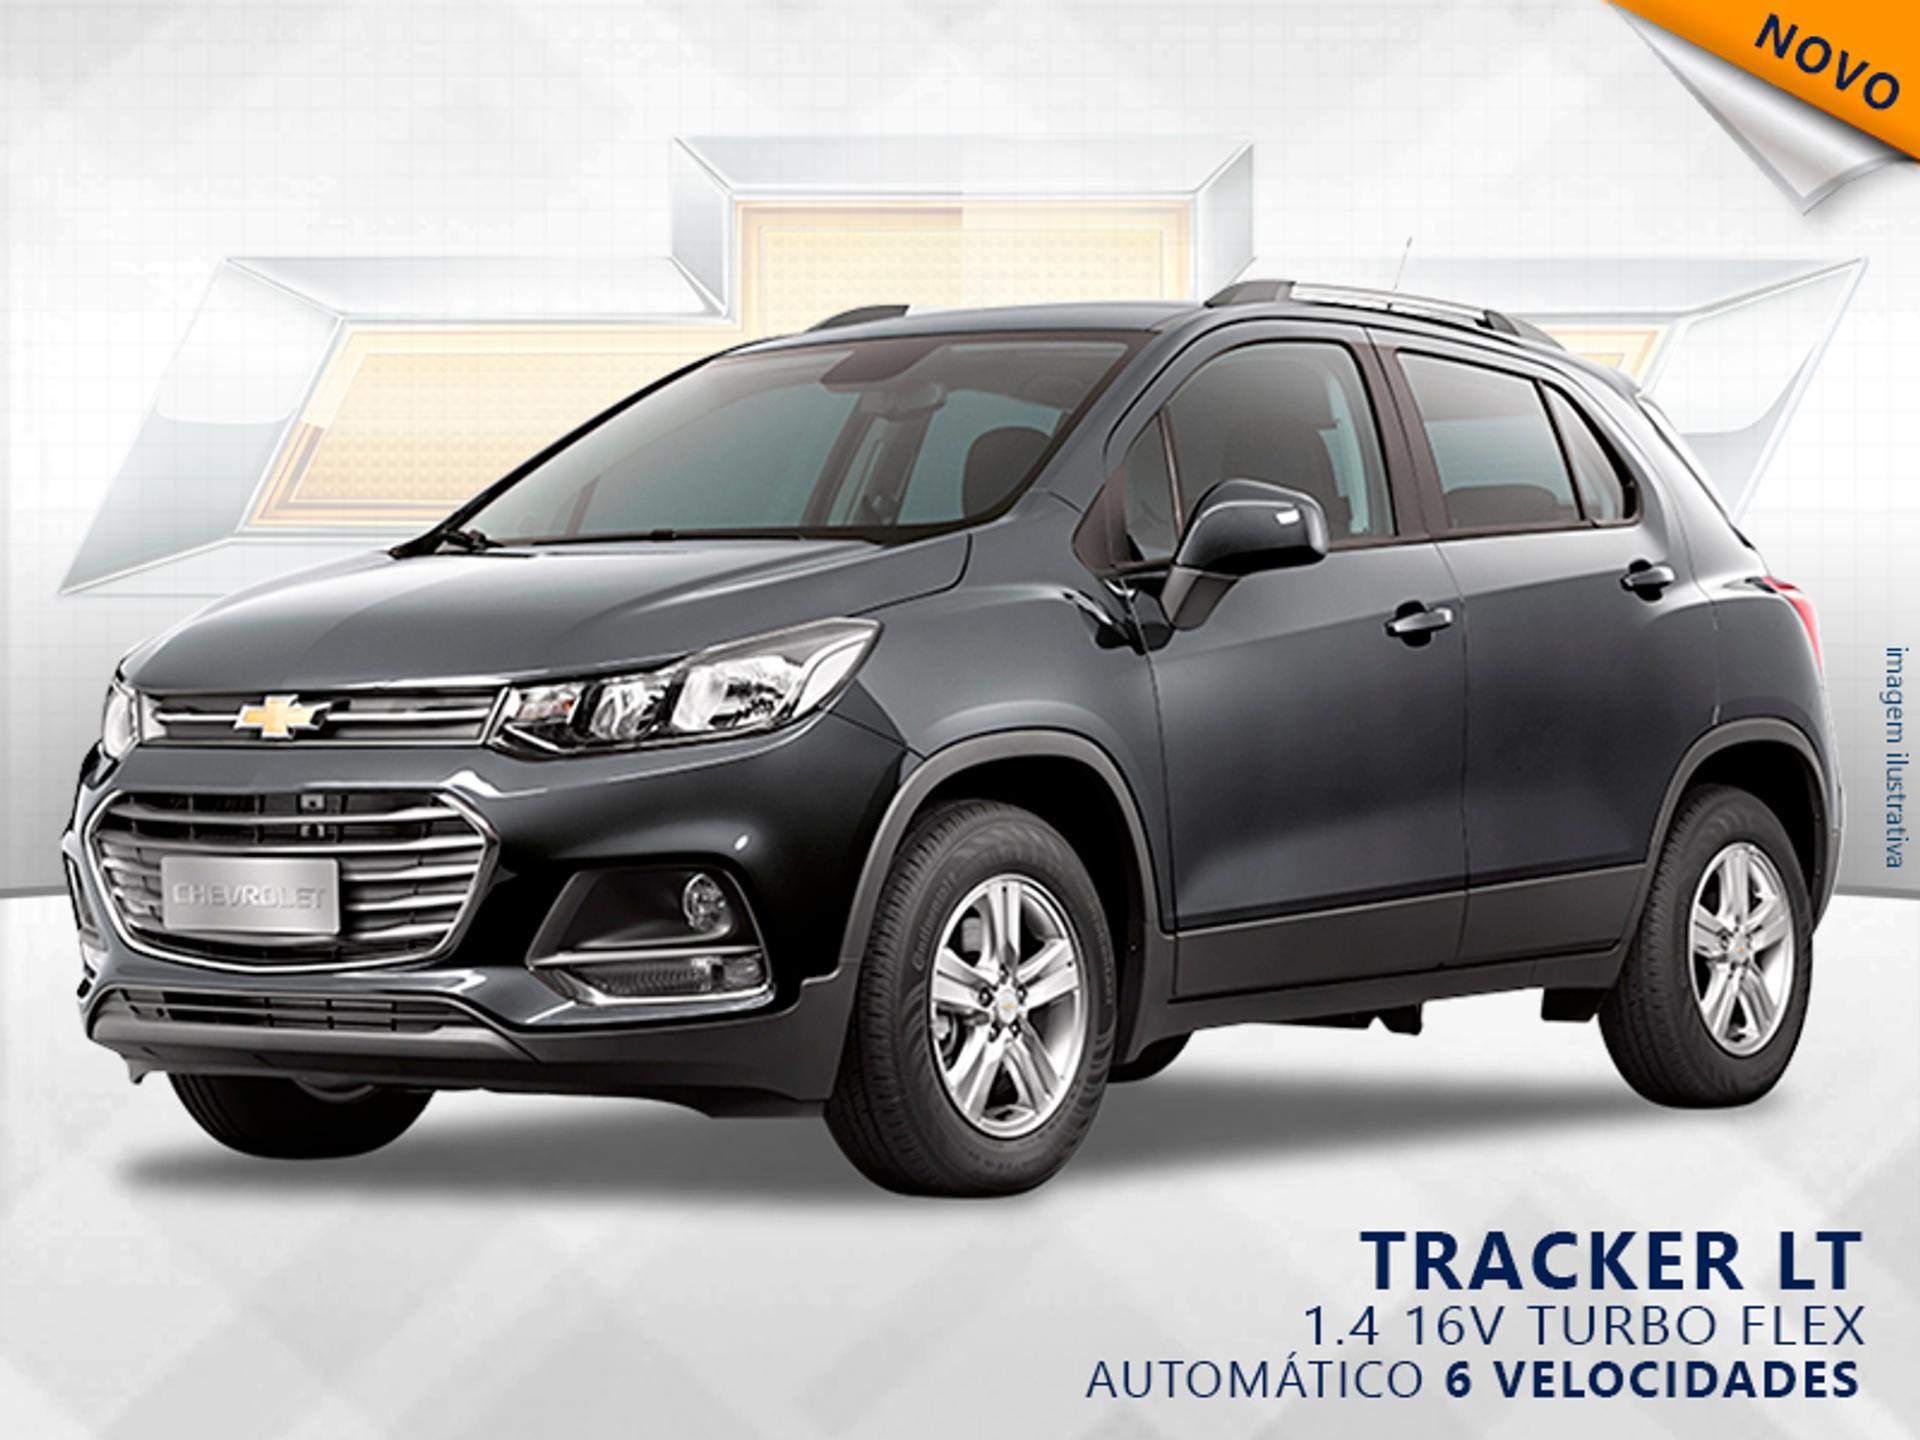 chevrolet-tracker-1.4-16v-turbo-flex-lt-automatico-wmimagem13383962323